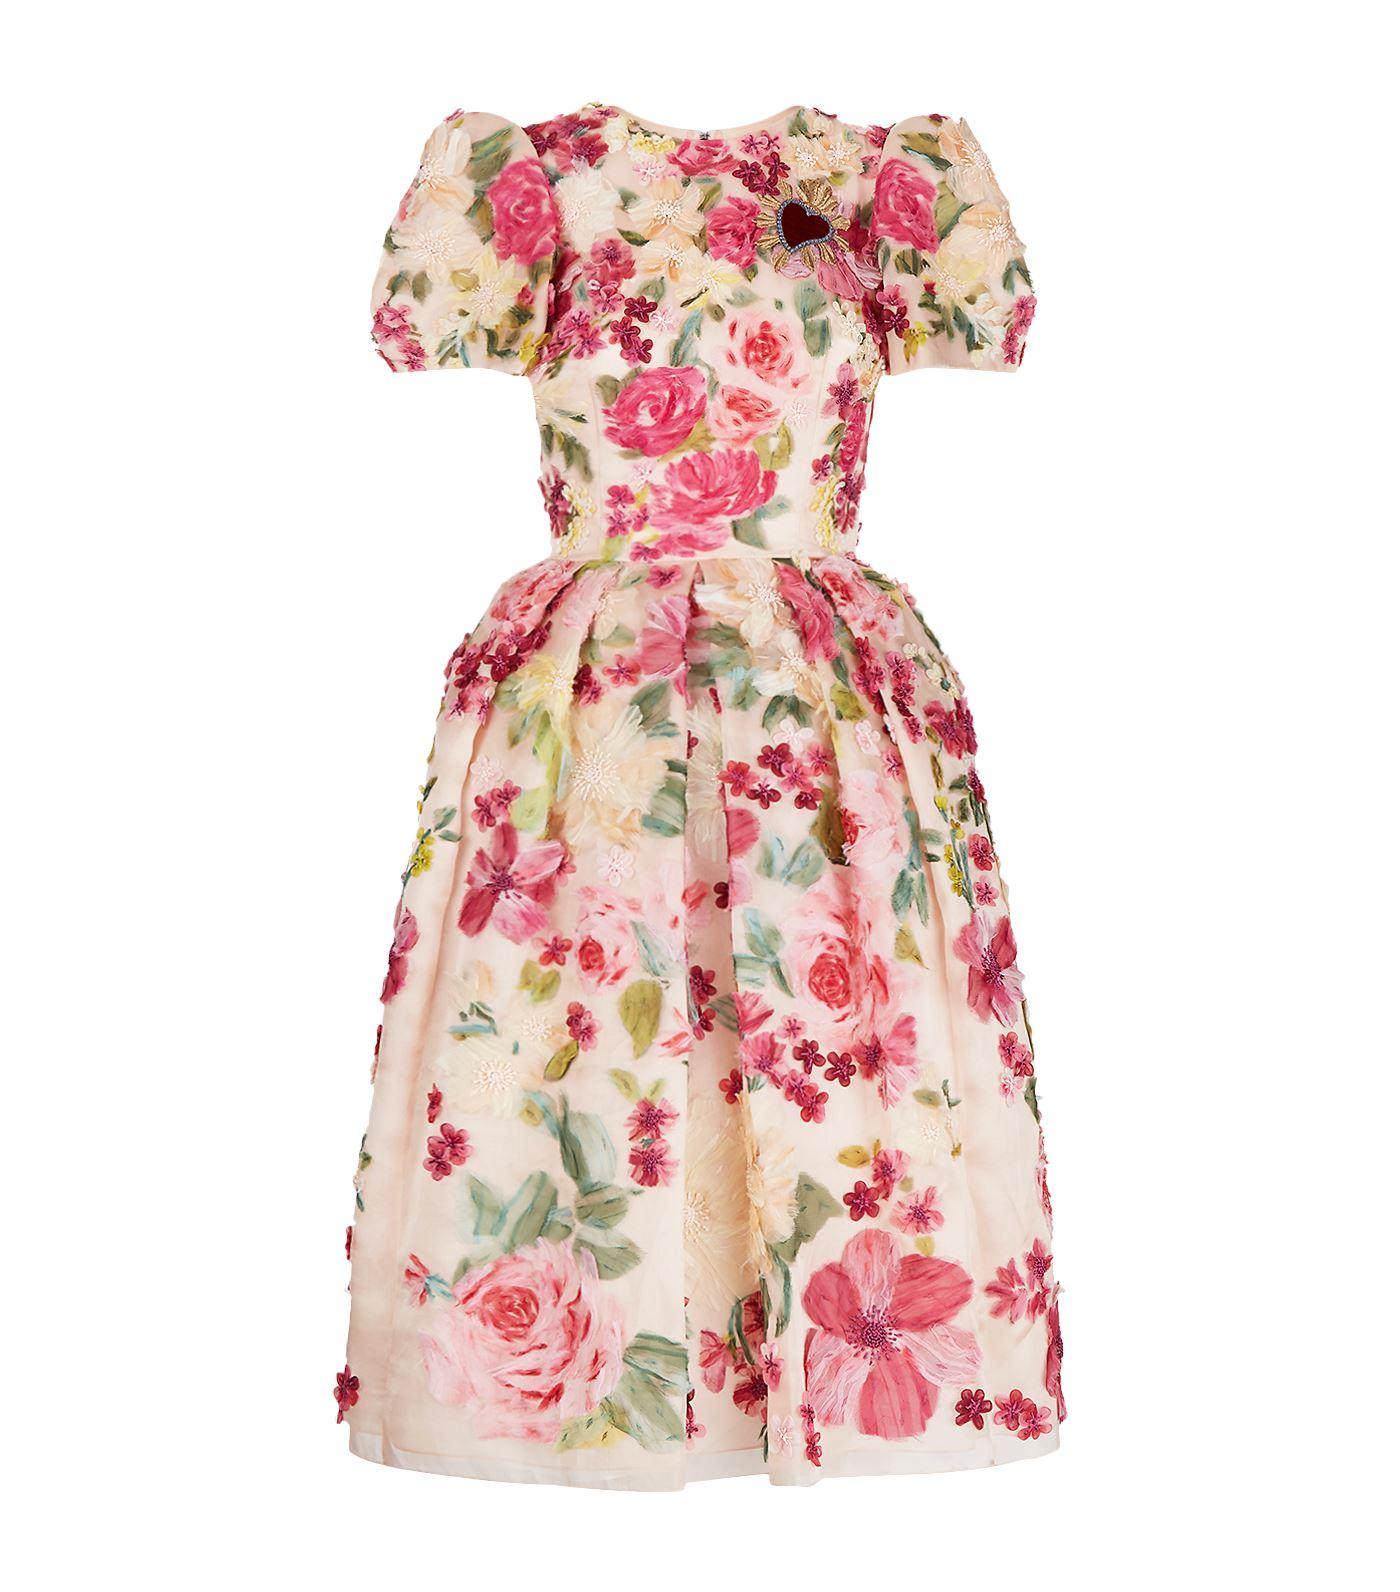 Dolce & Gabbana Floral AppliquÉ Dress In Multi